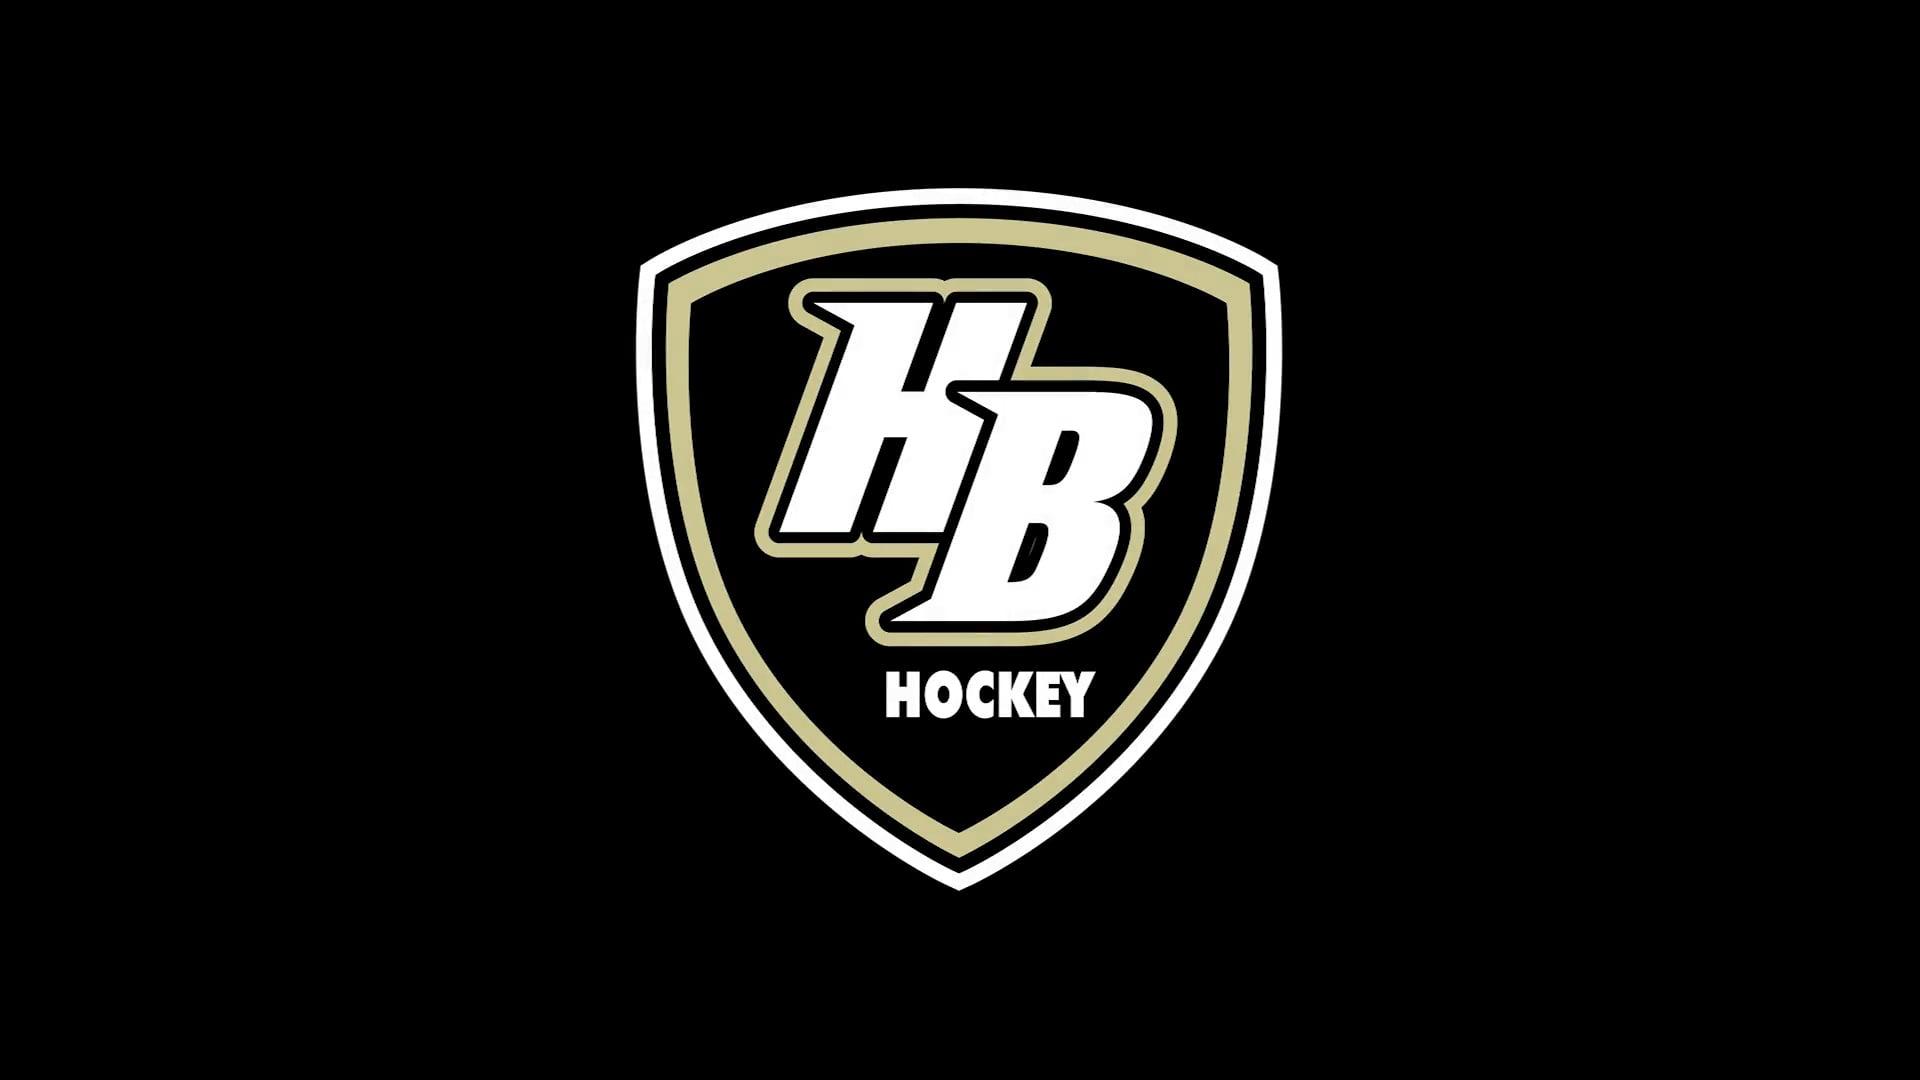 Quebec 2017 - '04 HoneyBaked trailer